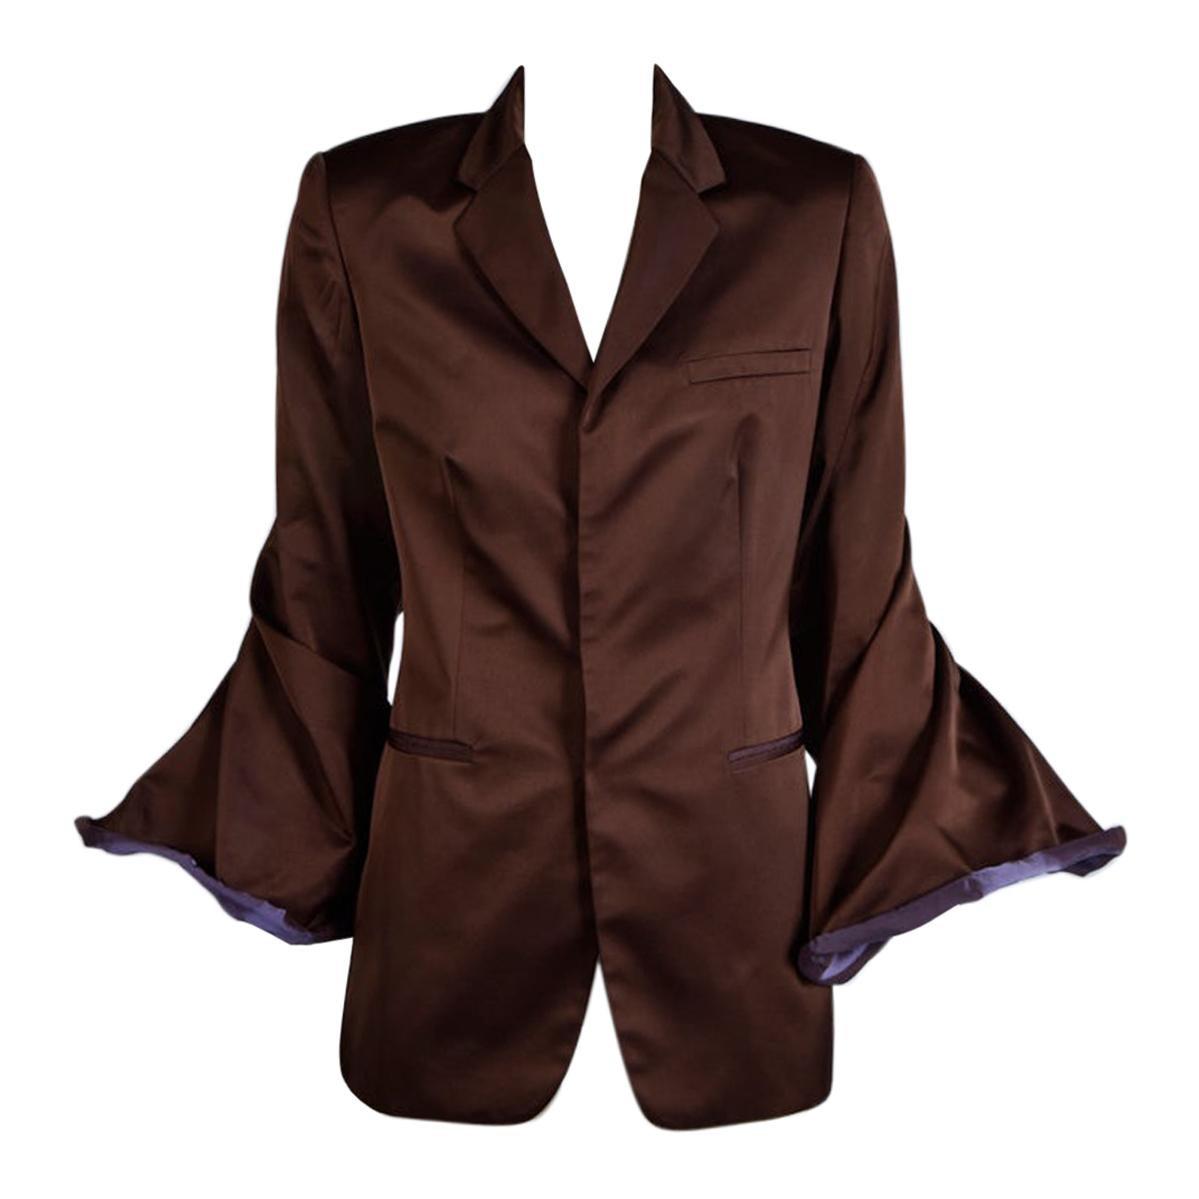 Jean Paul Gaultier Evening Blazer Jacket